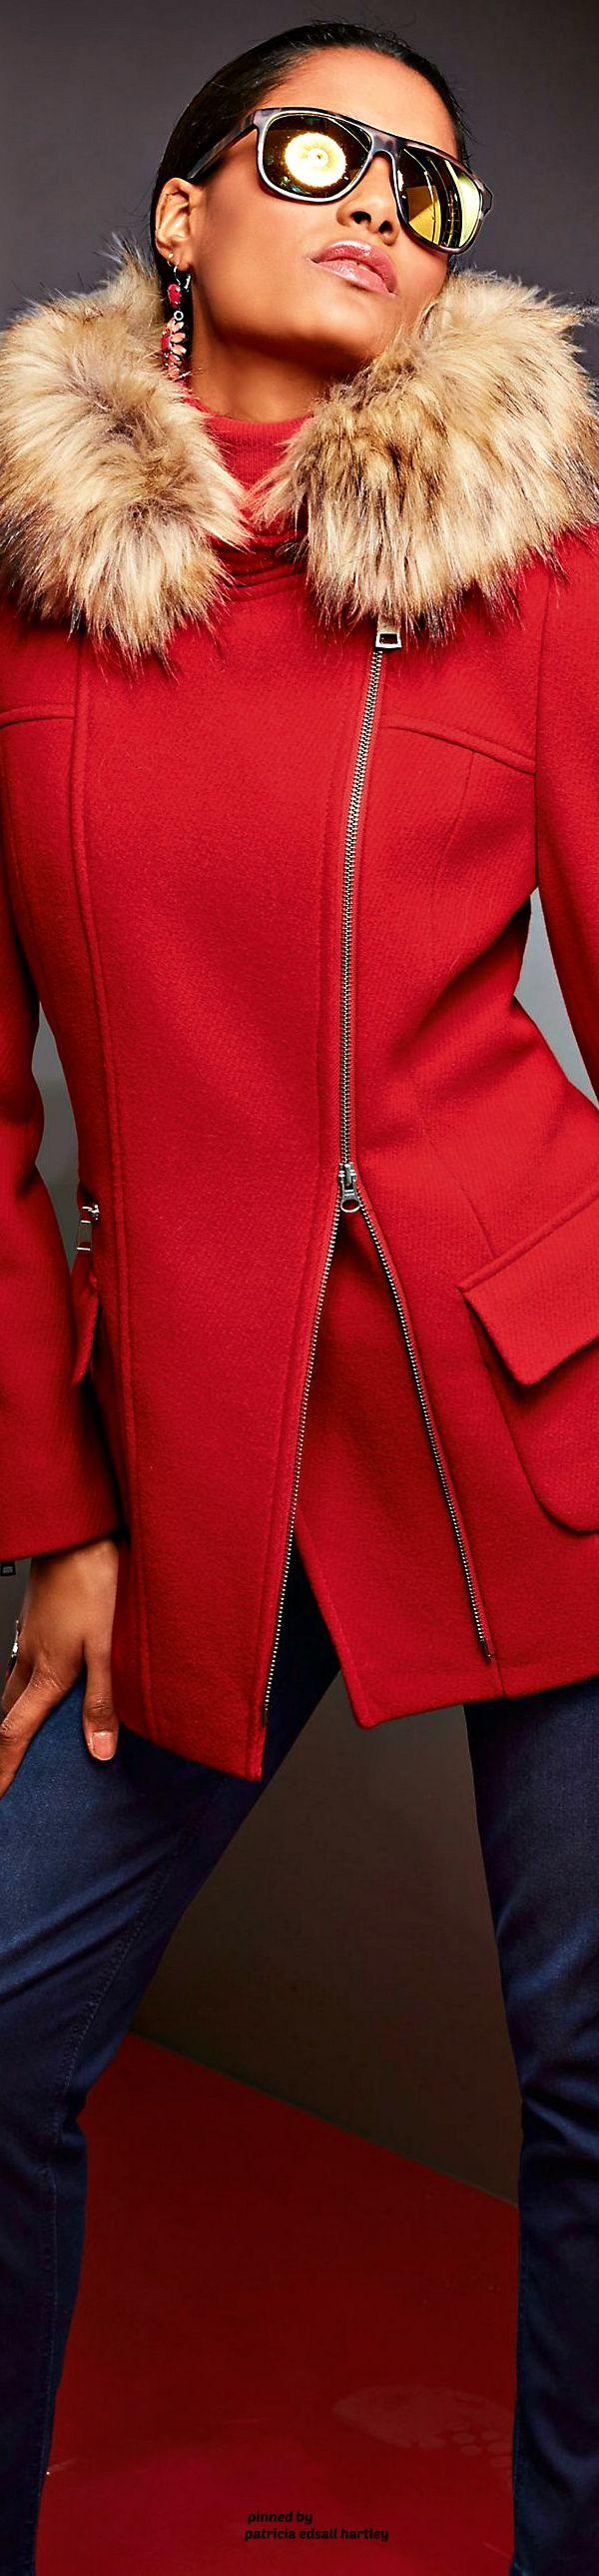 Rosamaria G Frangini | RED DESIRE | Madeleine Fashion